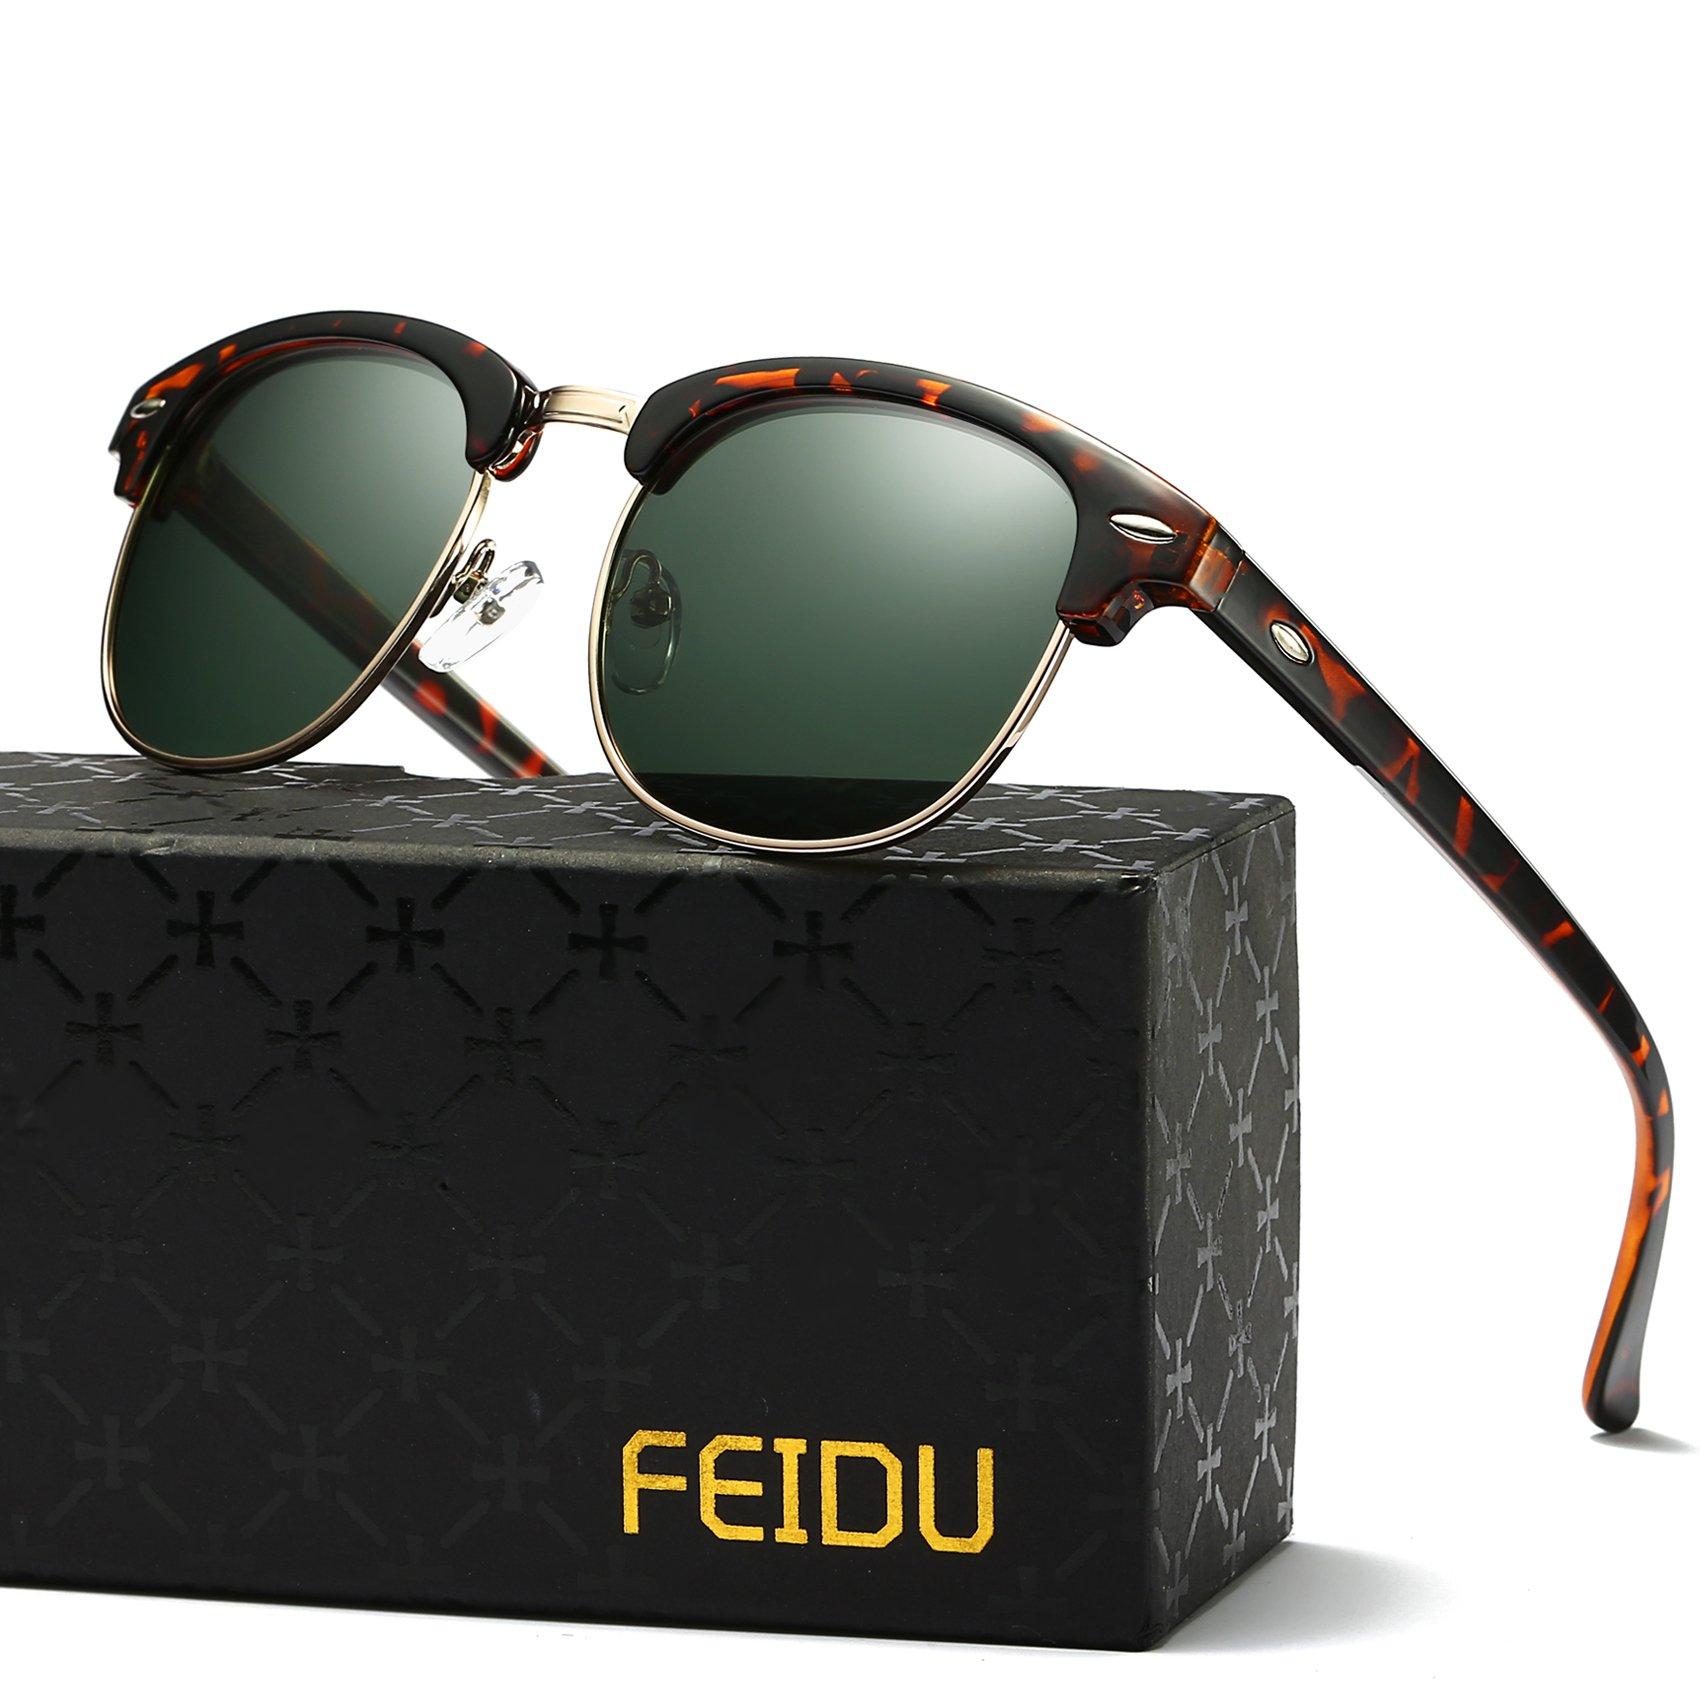 a161c504ec7d Galleon - Retro Mens Sunglasses For Men - FEIDU Half Metal Polarized  Sunglasses For Women FD3030 (green/leopard, 2.04)